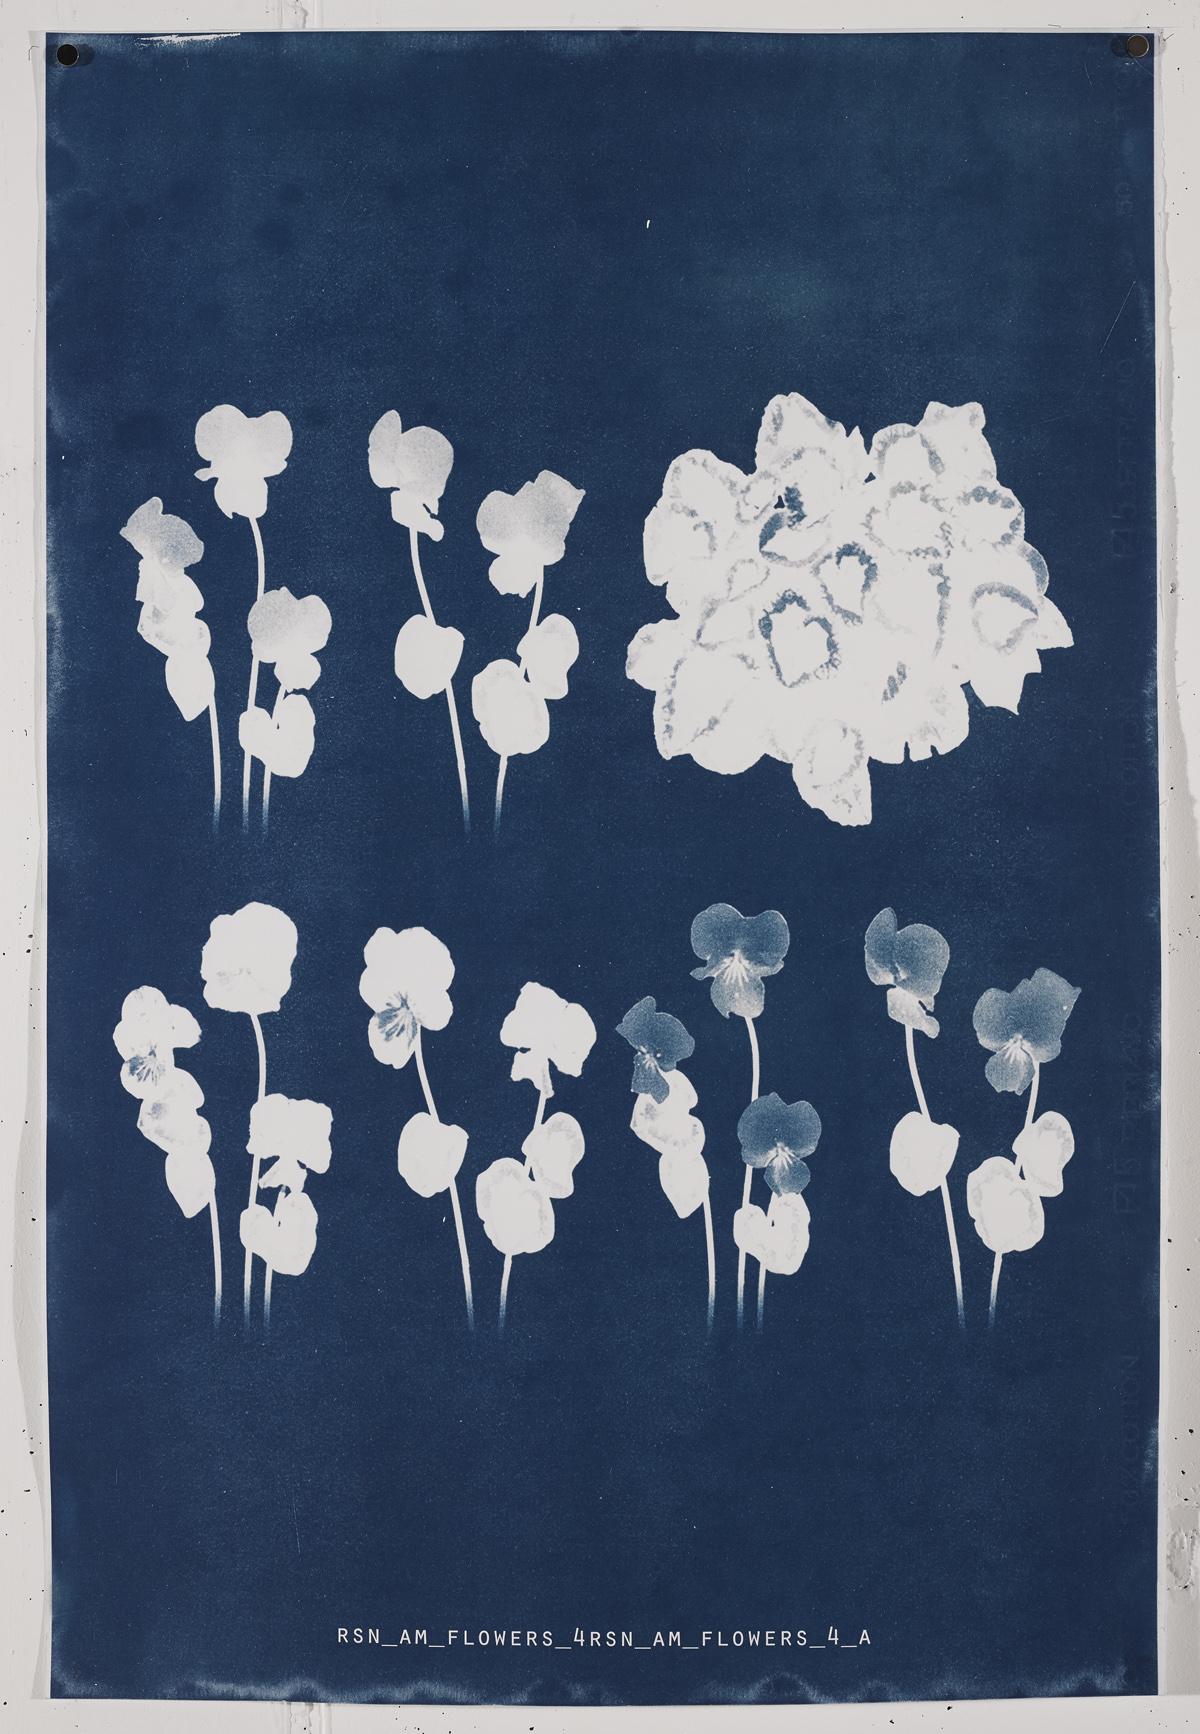 AM FLOWERS 2017 Unique cyanotype print on Frabriano No.5. 90.4cm x 61cm